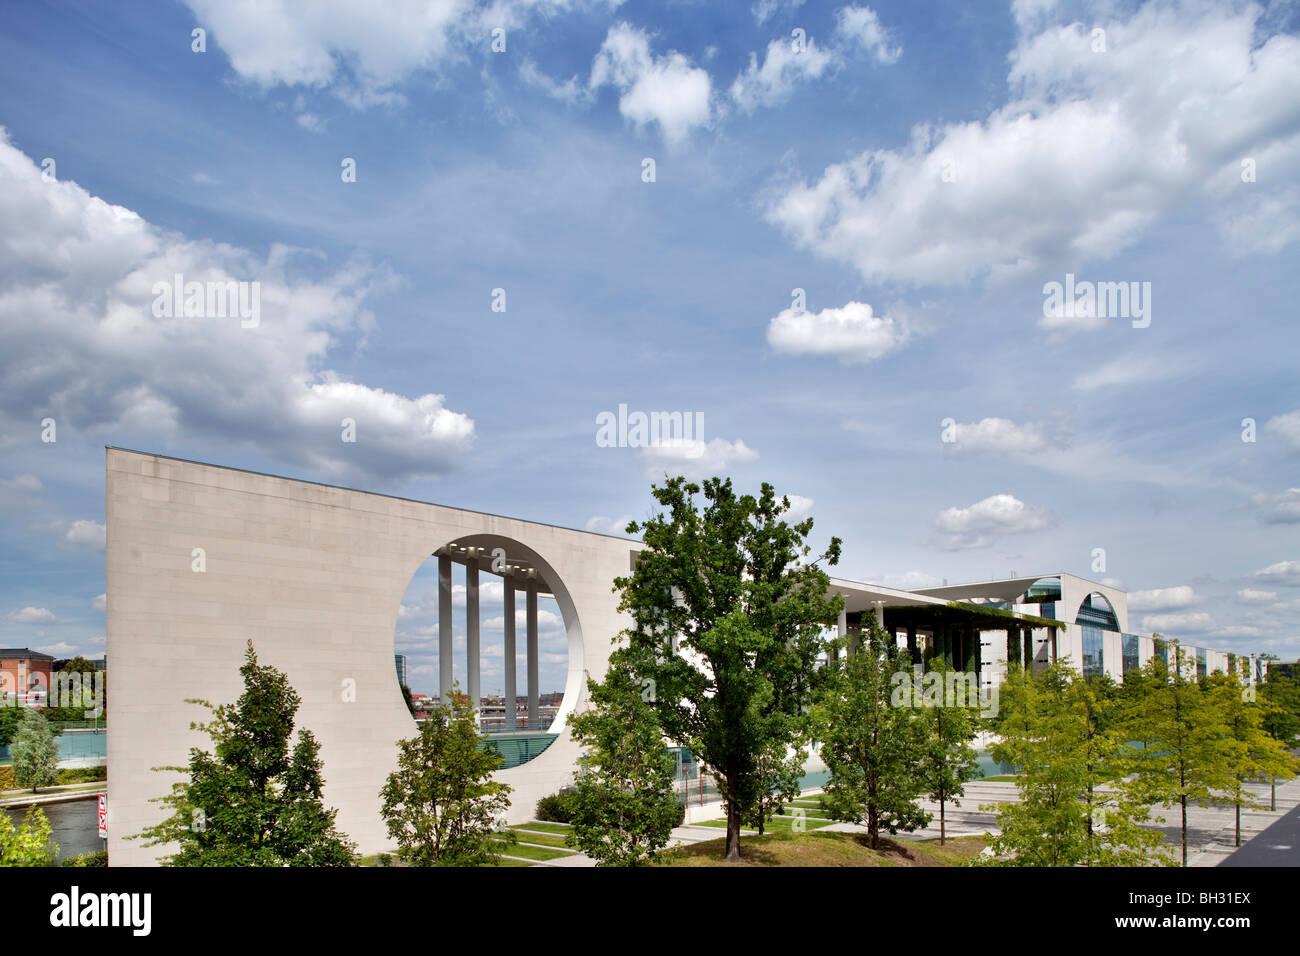 German Chancellery building, Berlin, Germany - Stock Image